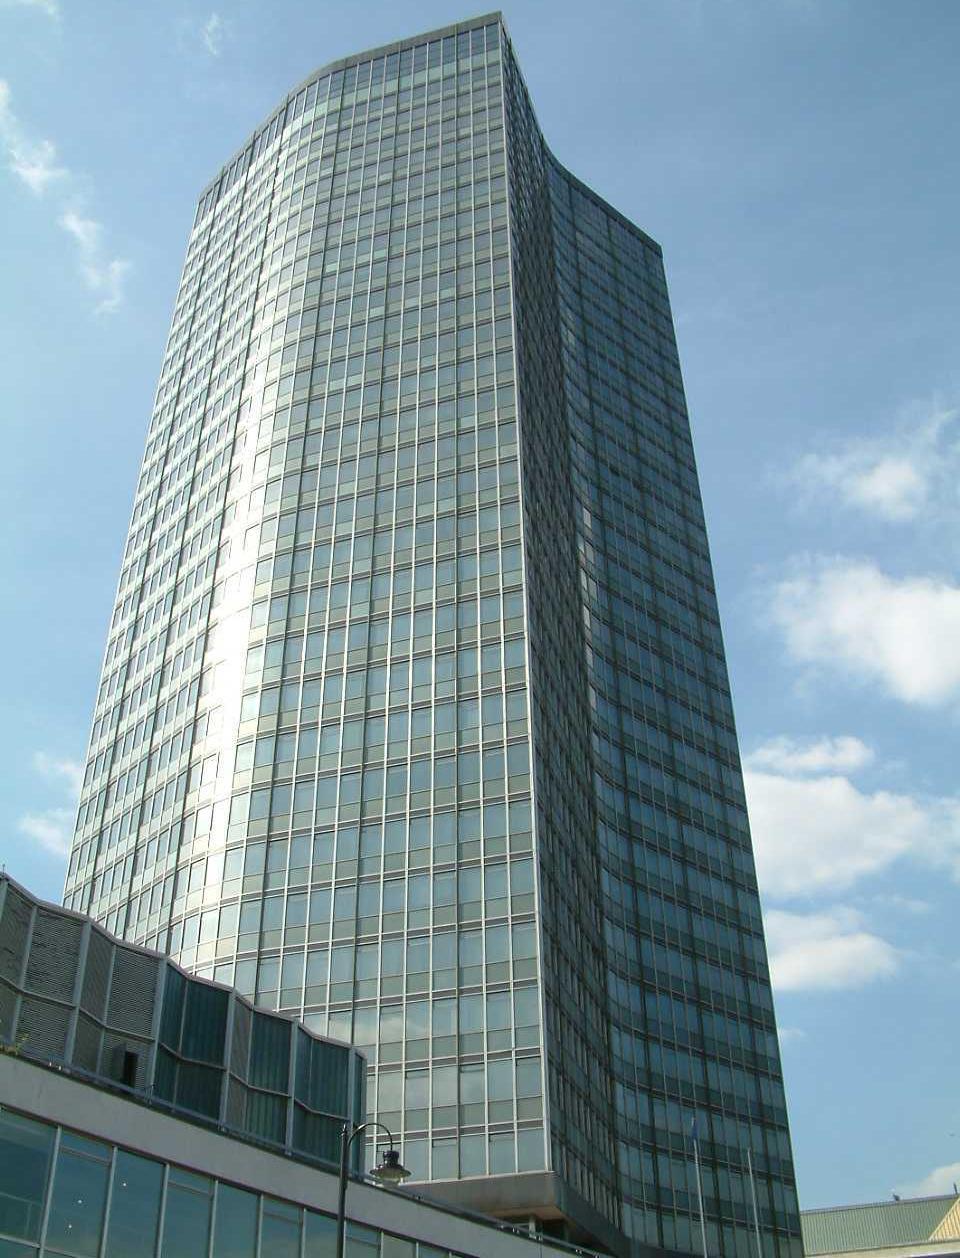 Millbank Tower - Wikipedia